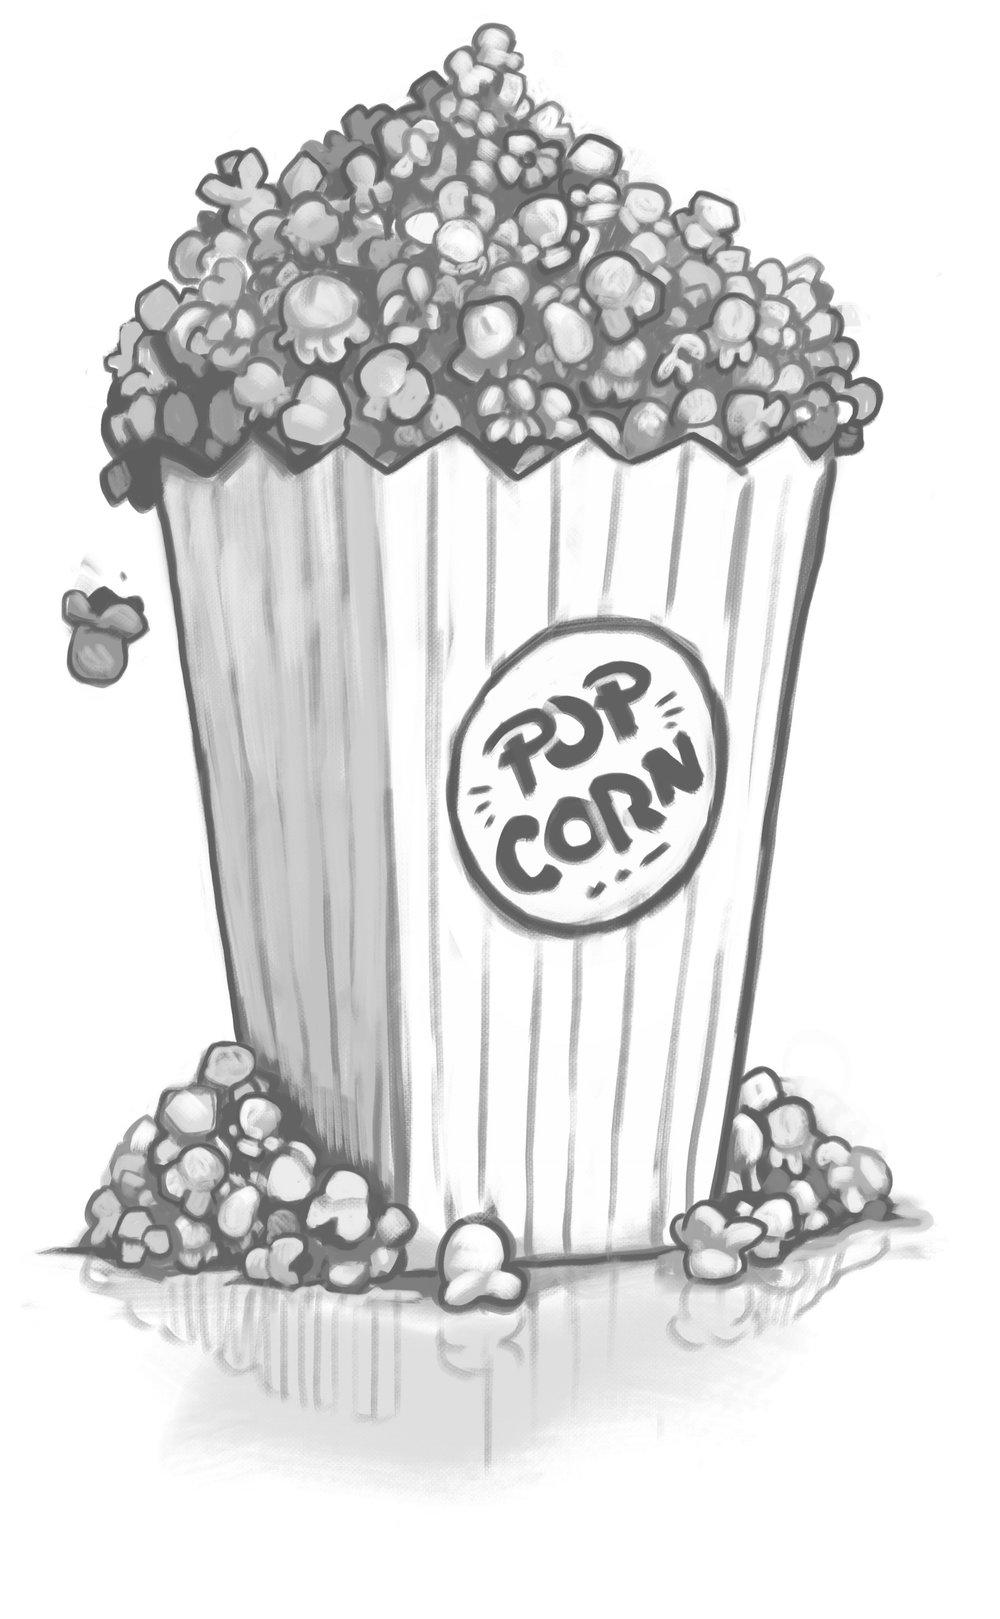 17_Popcorn.jpg